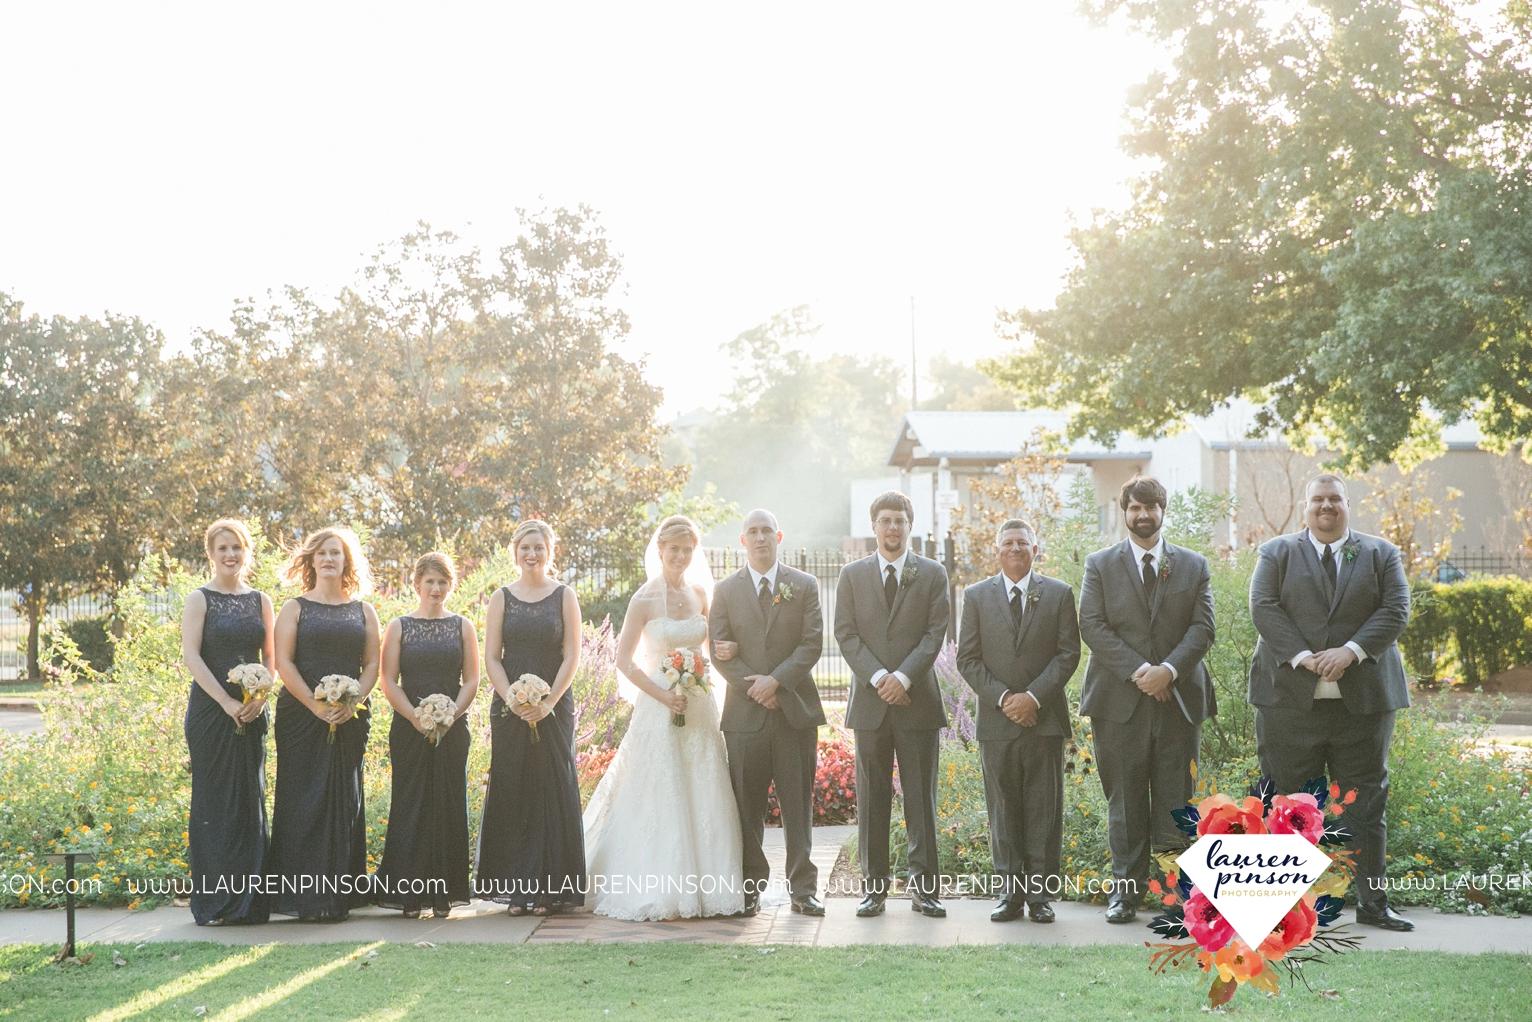 kemp-center-for-the-arts-wichita-falls-texas-wedding-photographer-fall-wedding-pumpkins-170.jpg